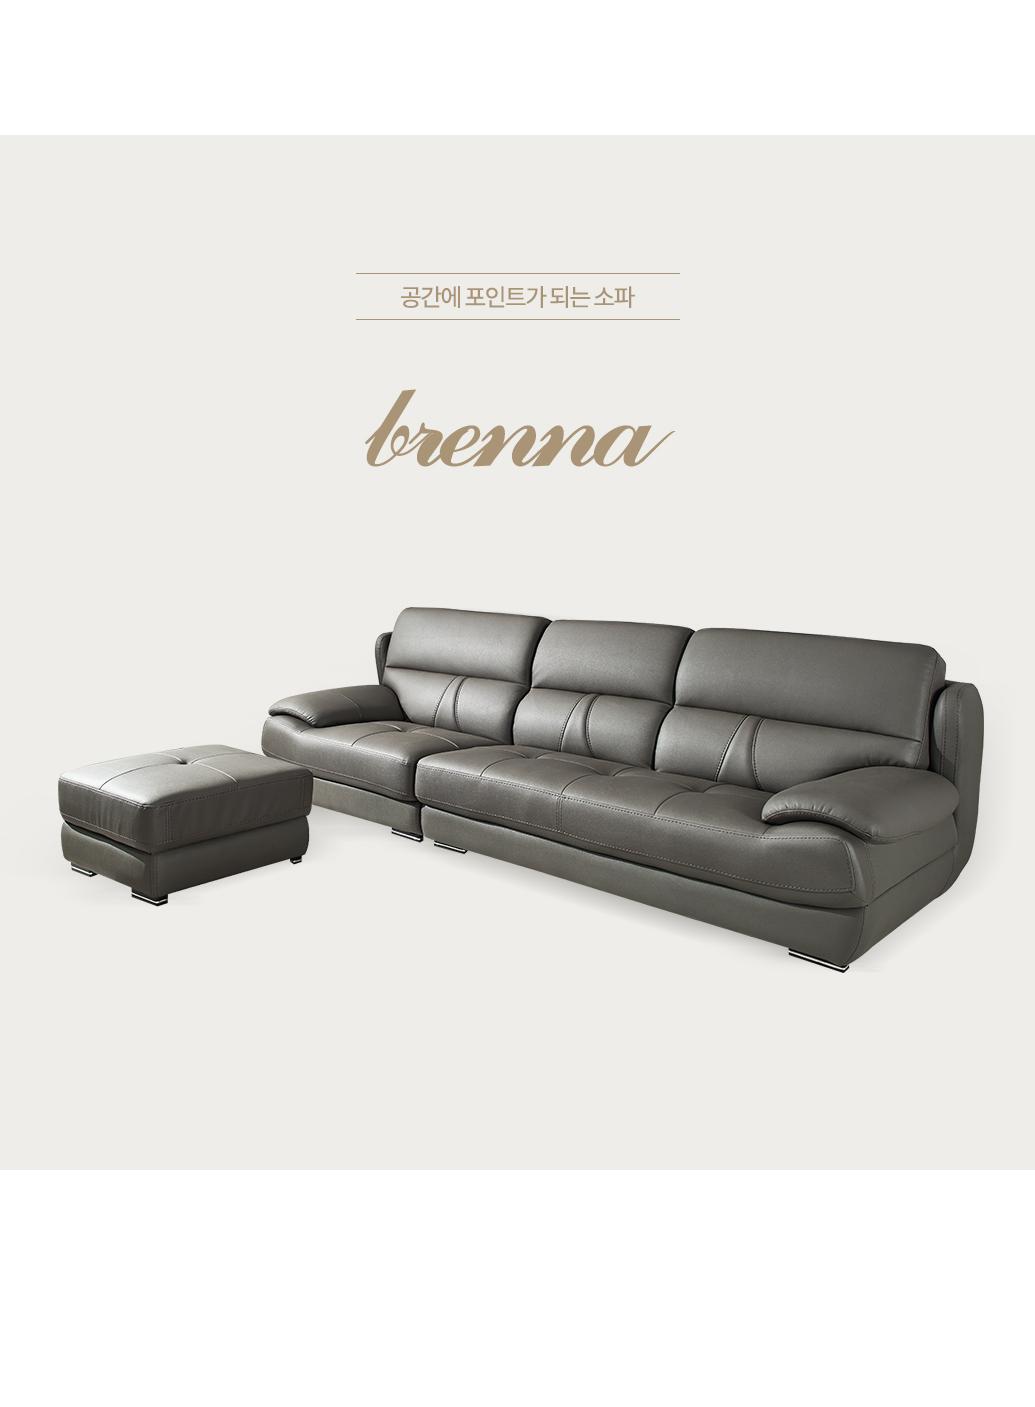 brenna07.jpg